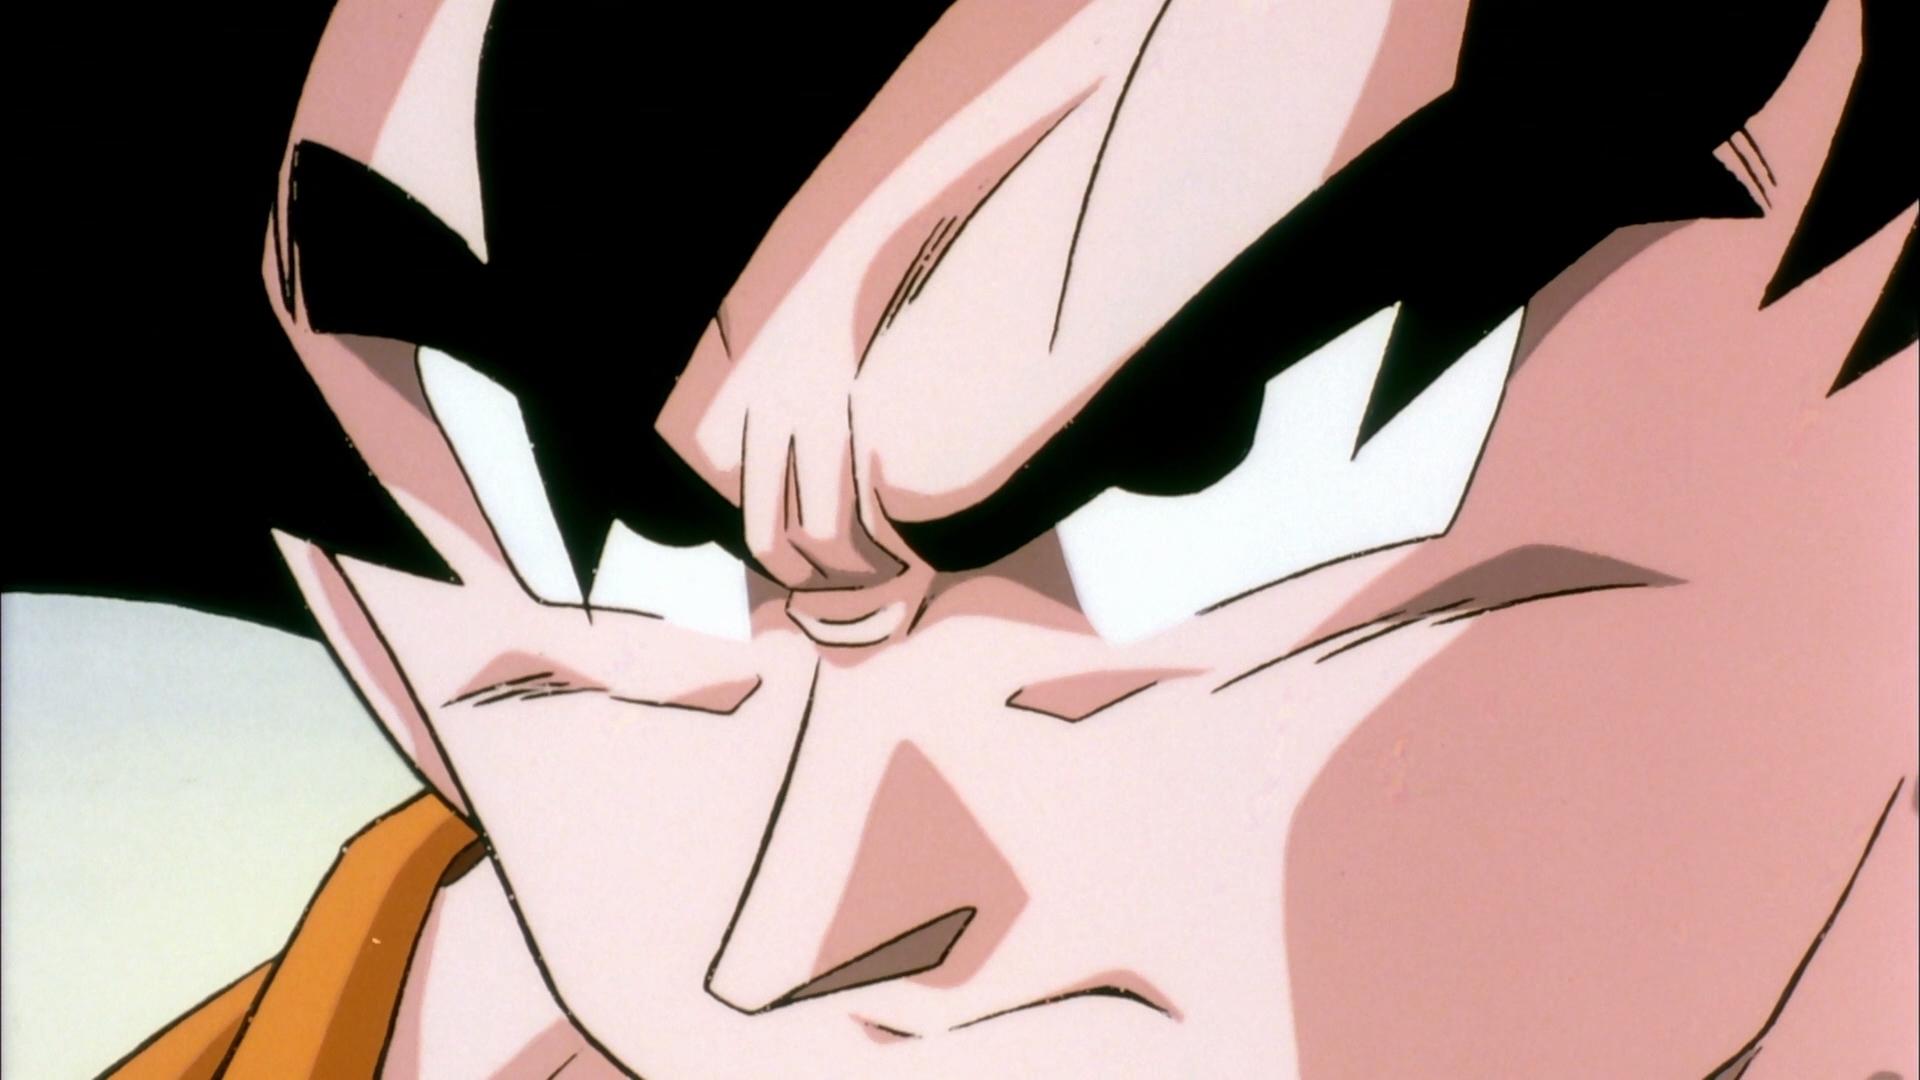 download wallpaper 1920x1080 anime man emotion anger